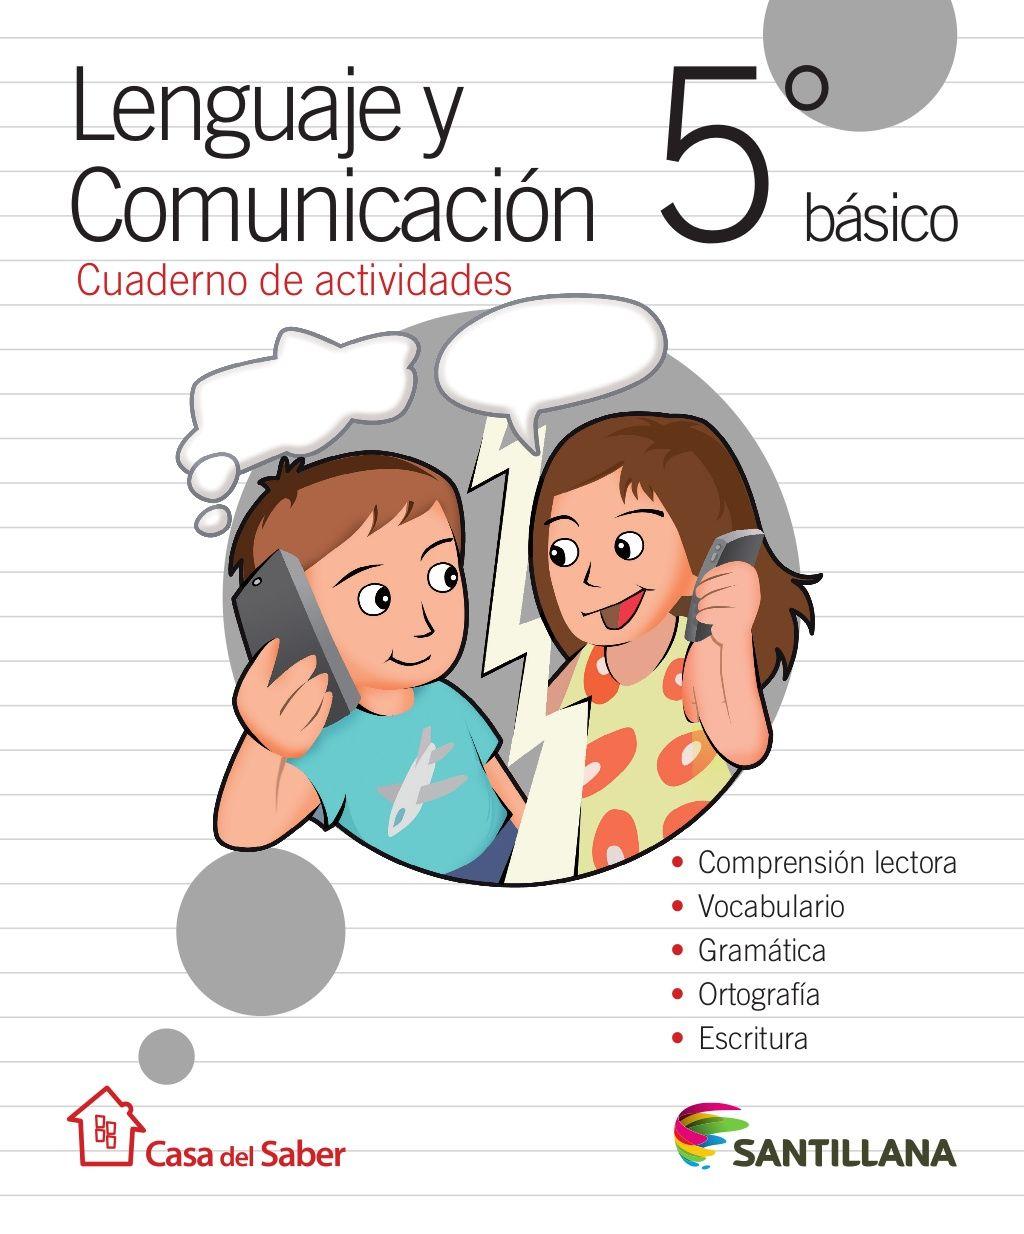 Cuaderno Actividades Lenguaje 5º by Profesora Geovanna via slideshare